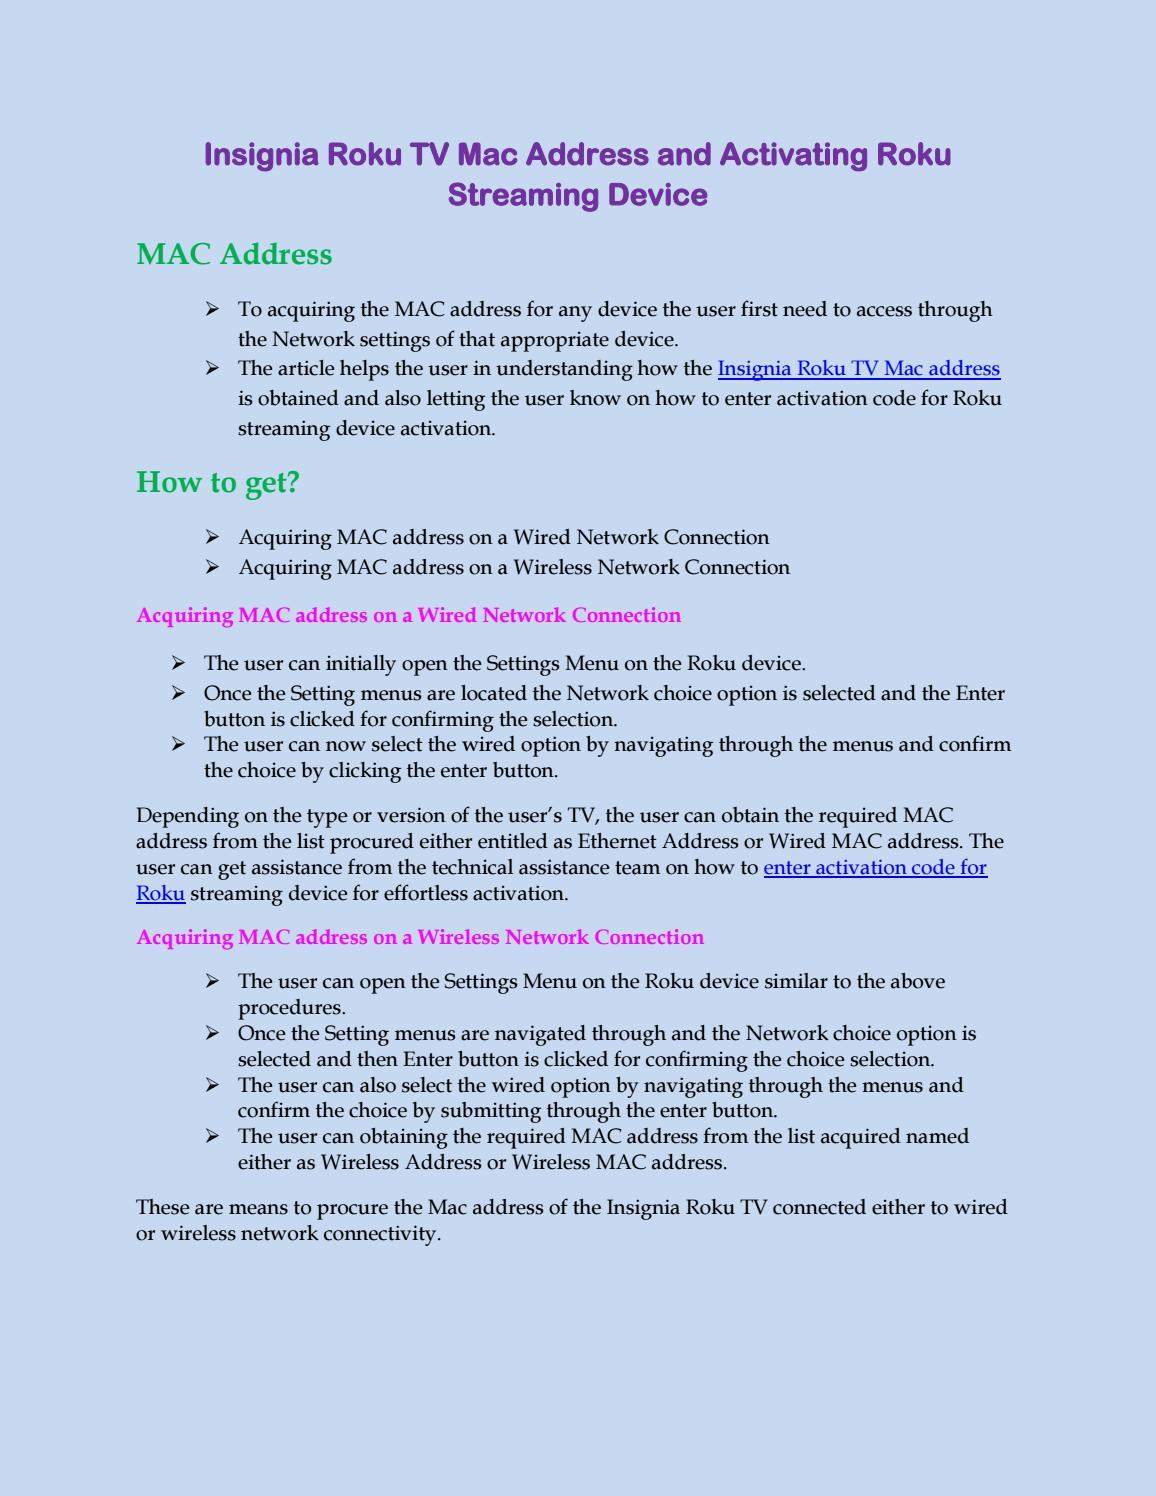 Insignia Roku TV Mac Address and Activating Roku Streaming